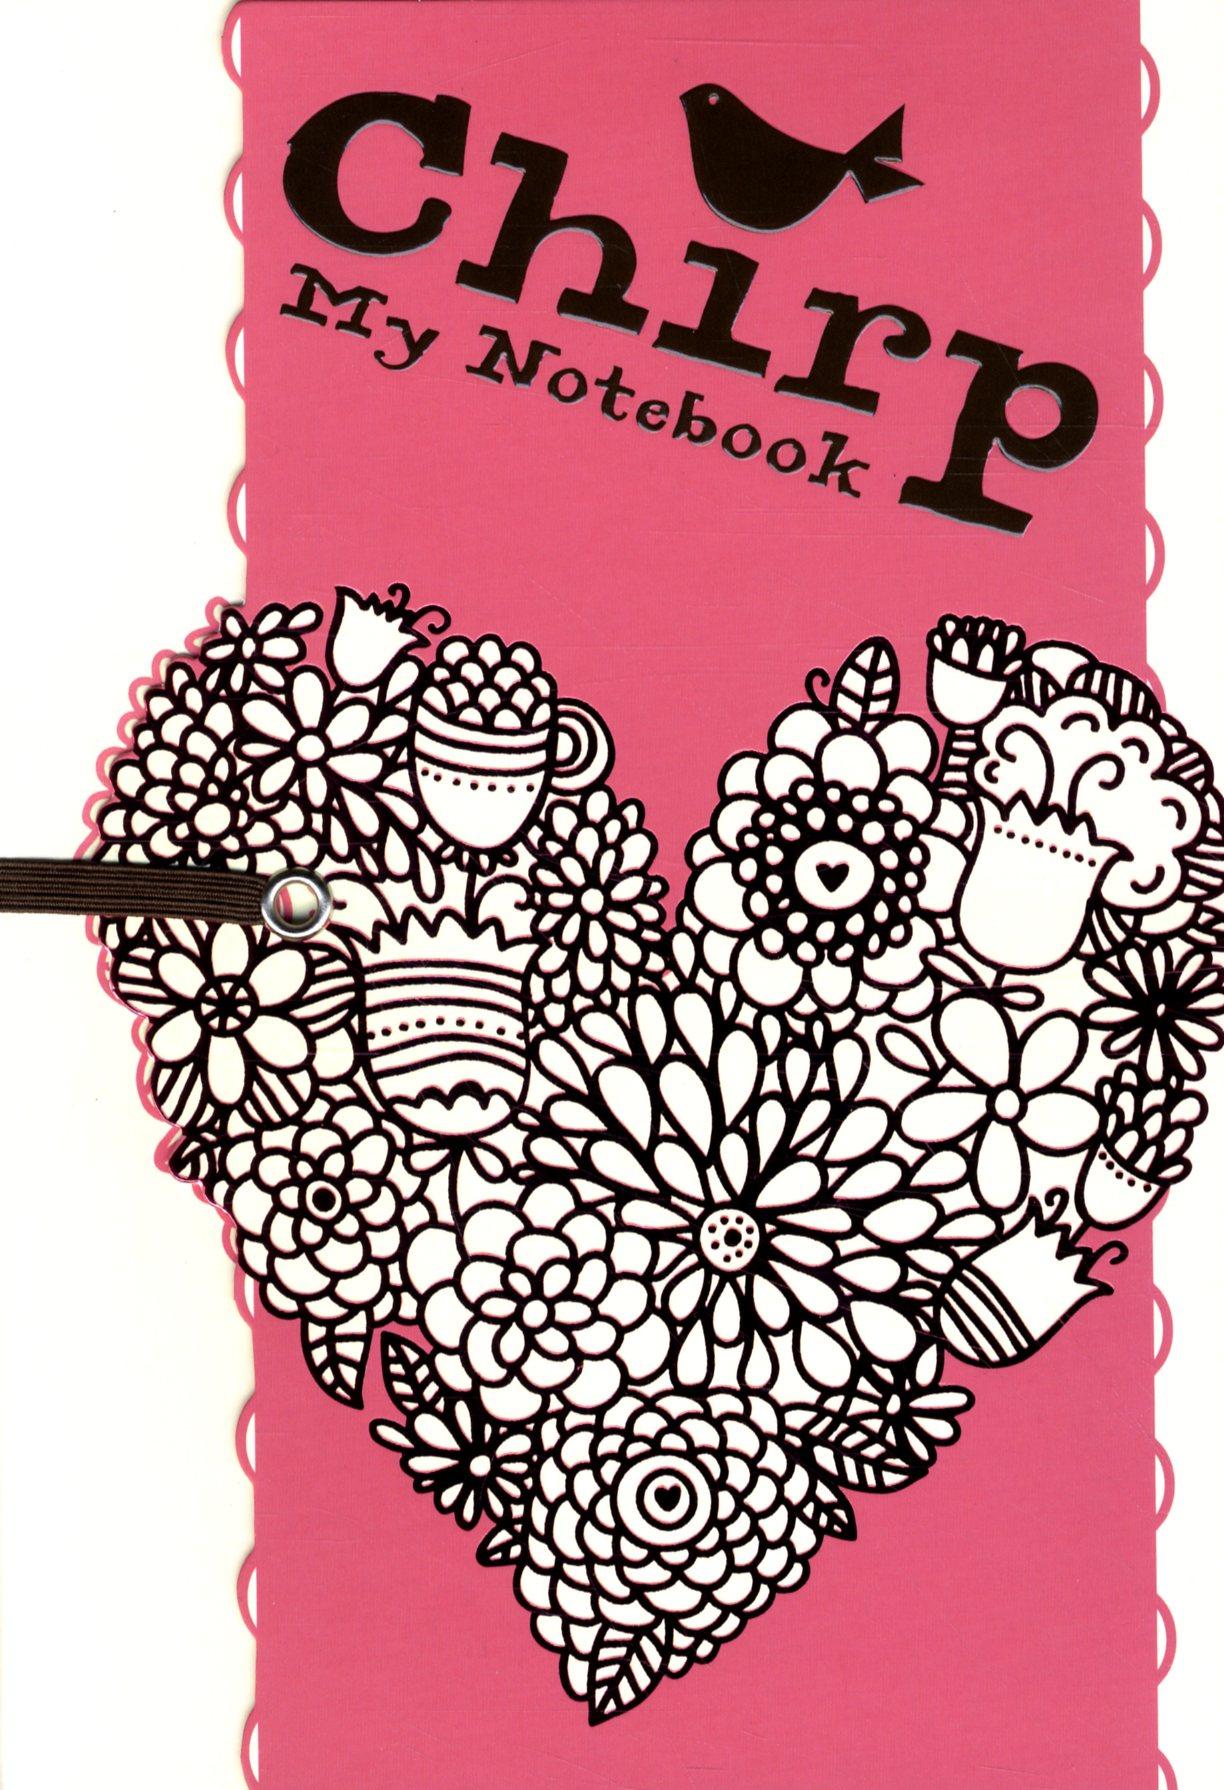 My notebook Chirp